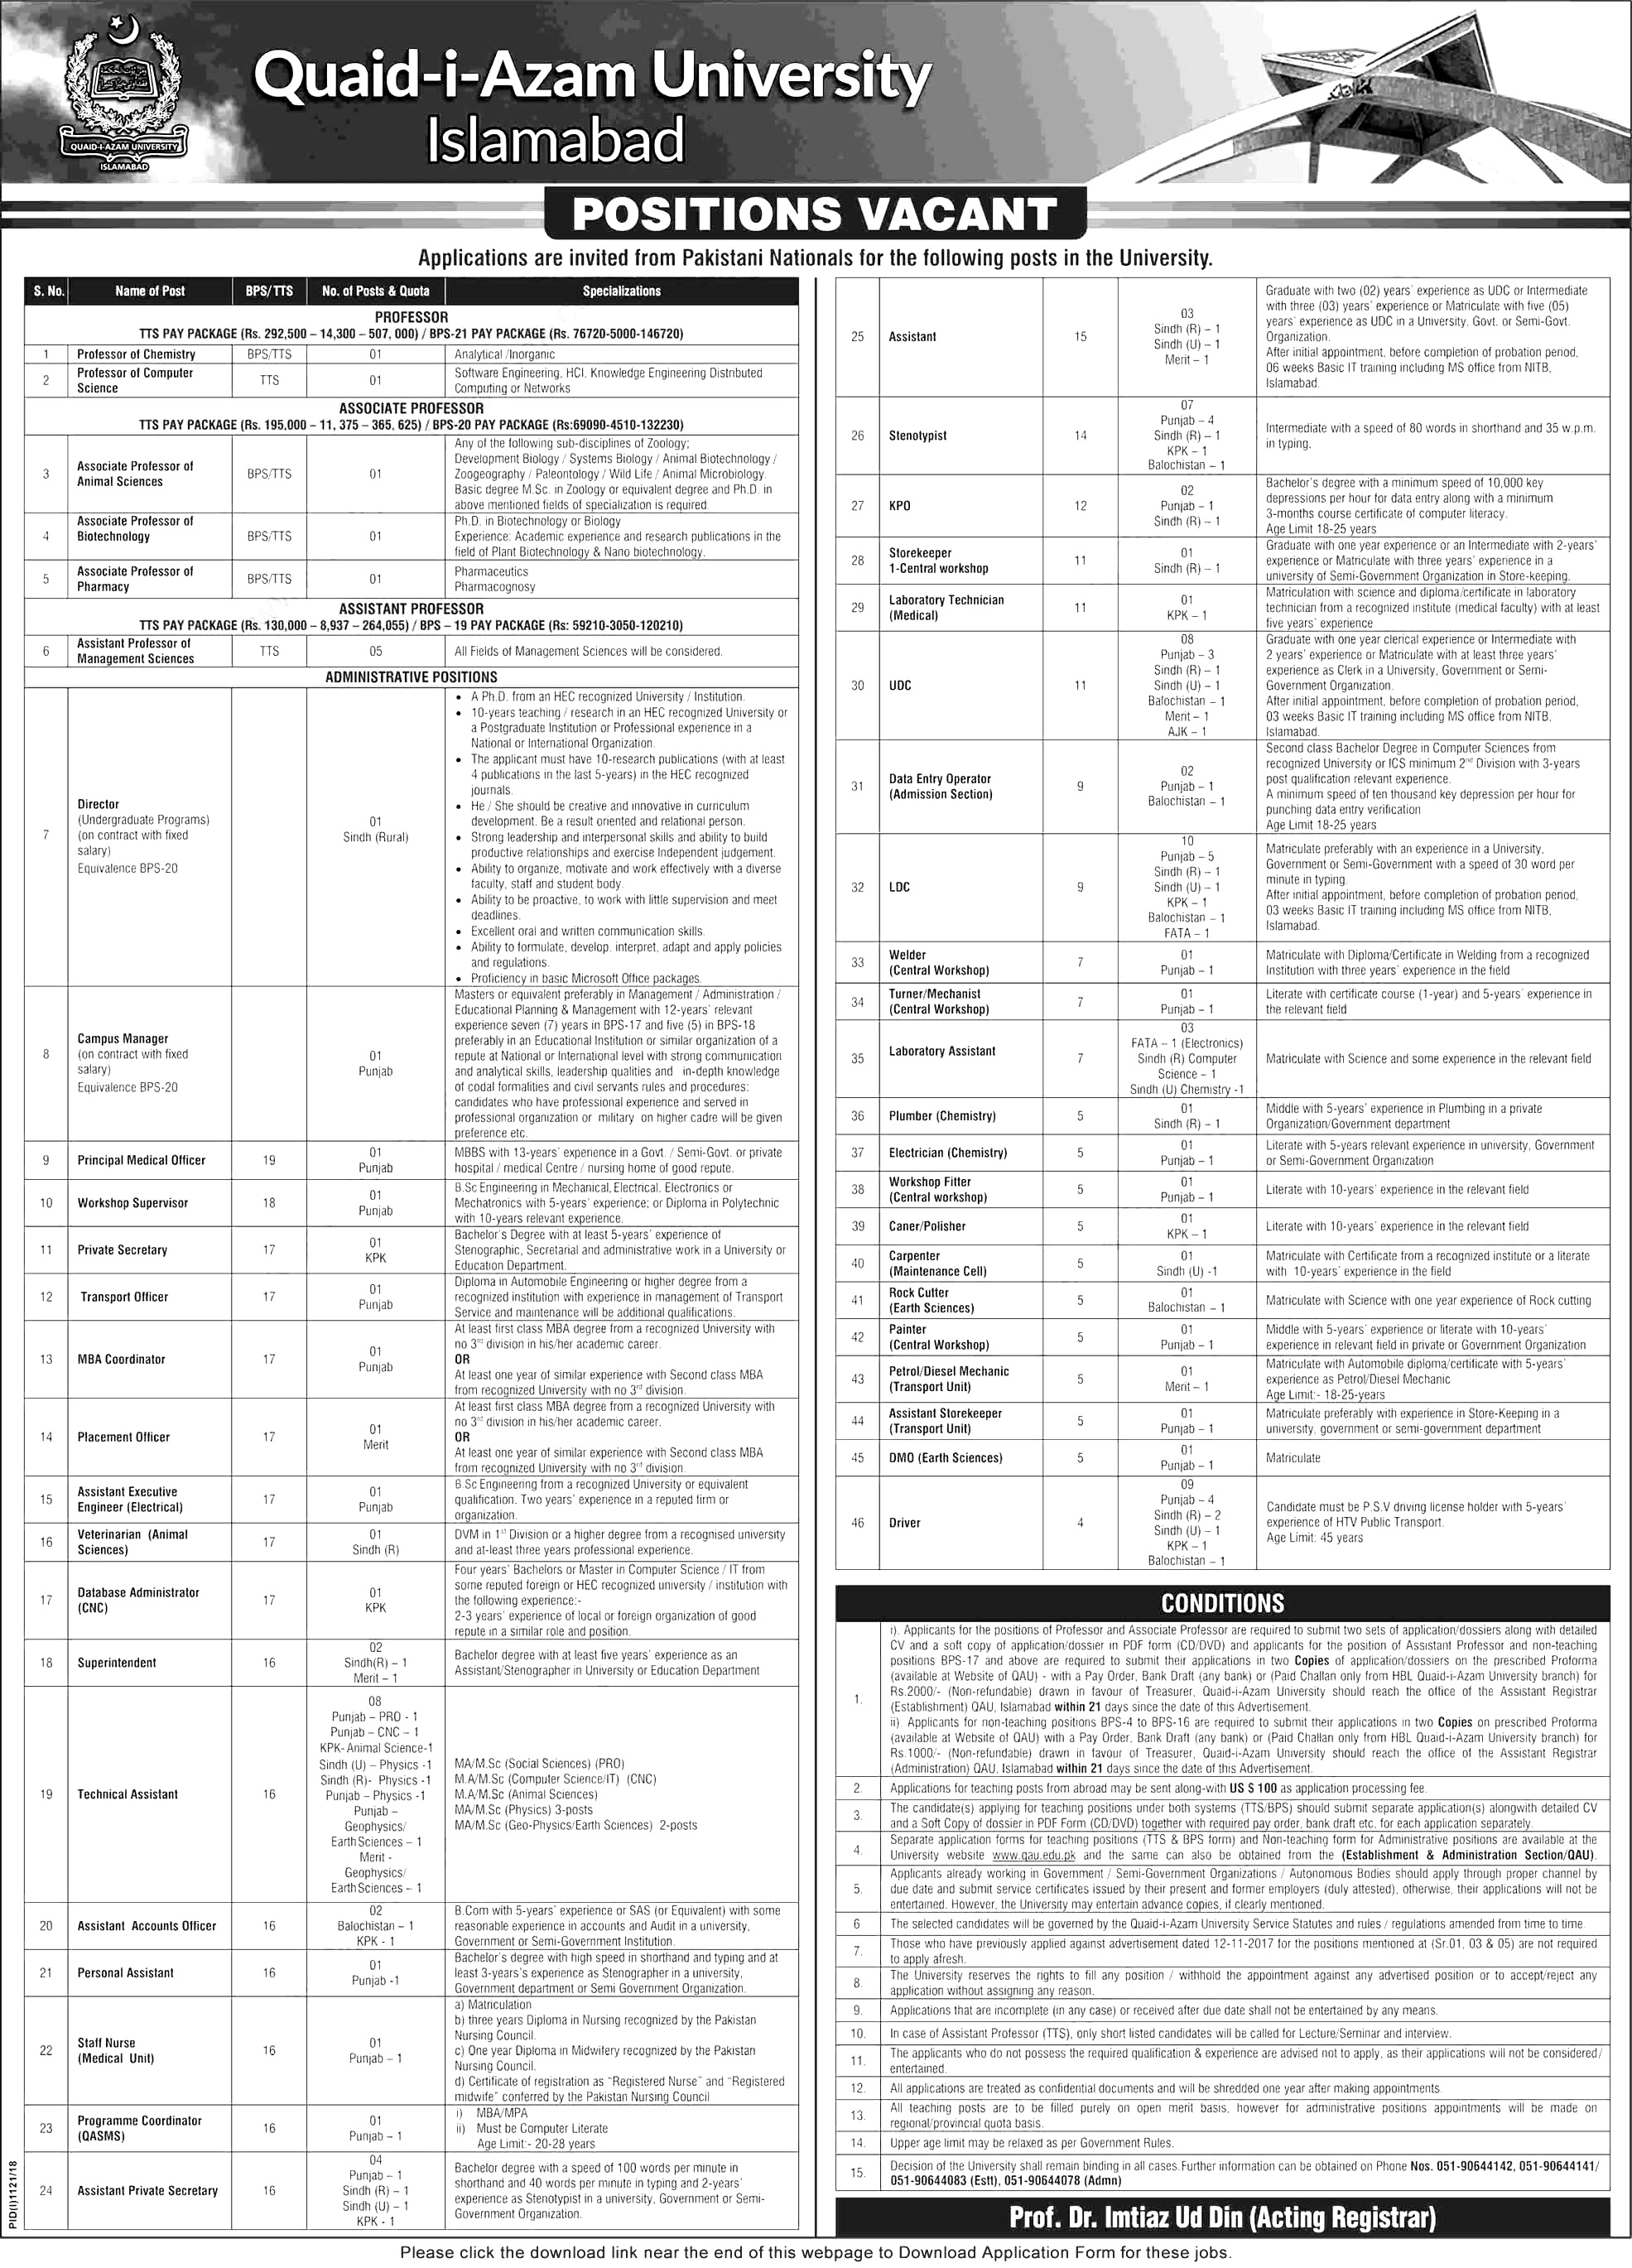 Quaid-e-Azam University Islamabad professor and admin staff Jobs 2018 application forms download online